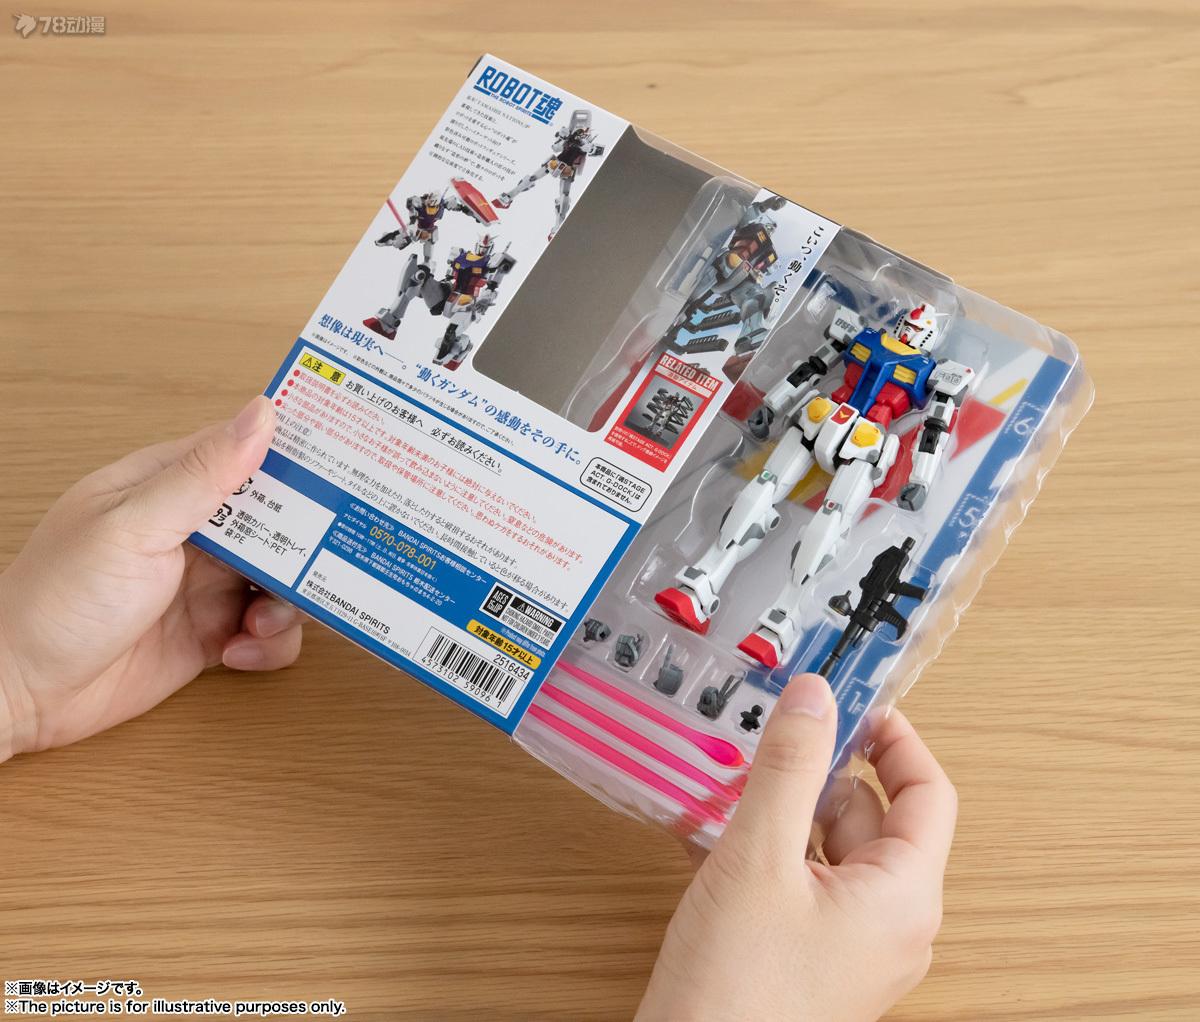 item_0000013443_vd59v0mN_06.jpg